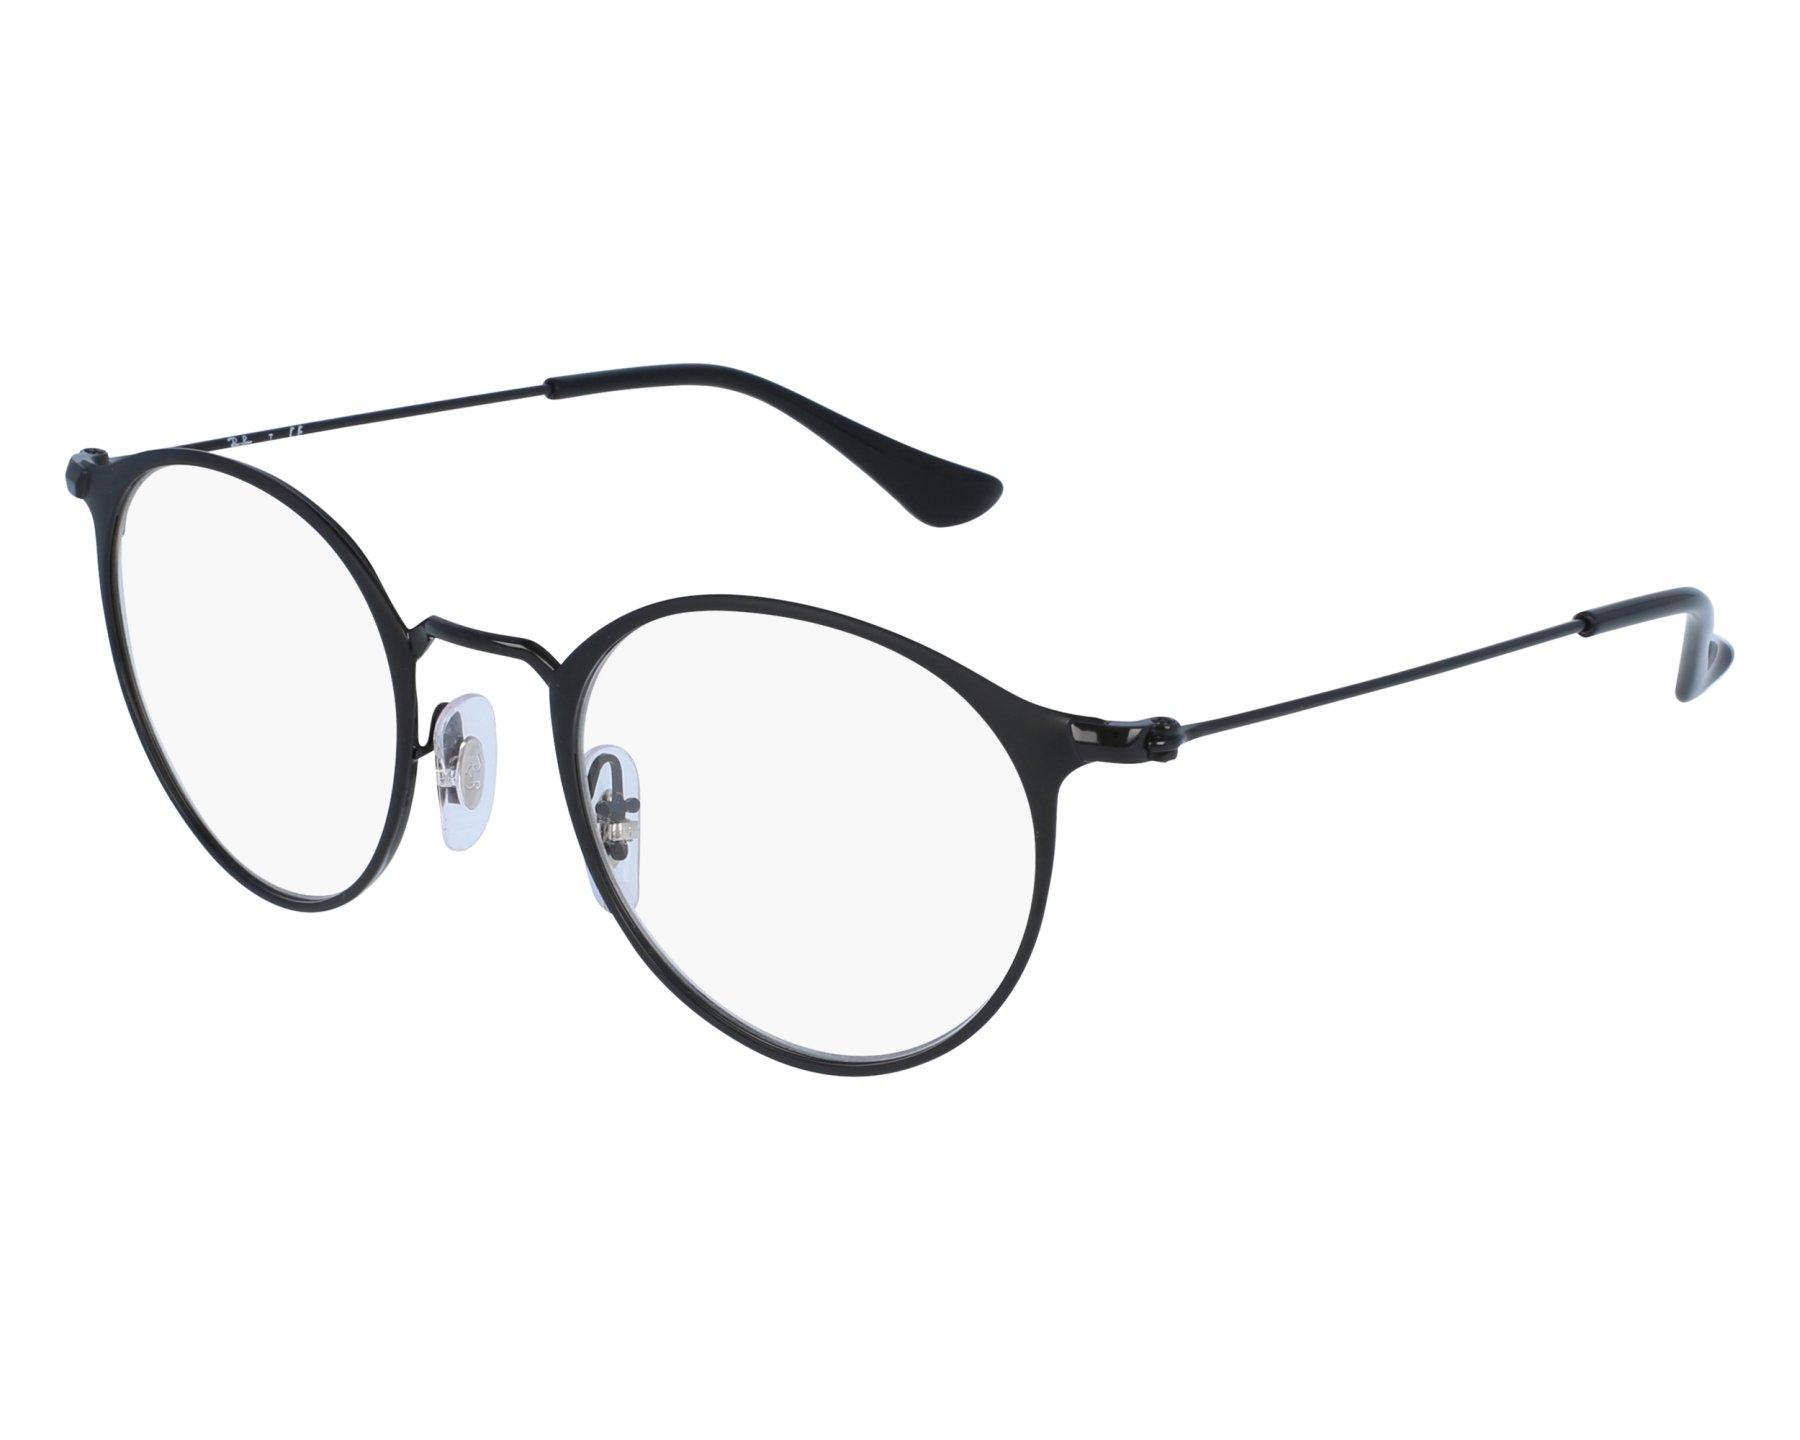 27b3fff983 Gafas Graduadas Ray-Ban RX-6378 2904 47-21 Negra vista de frente